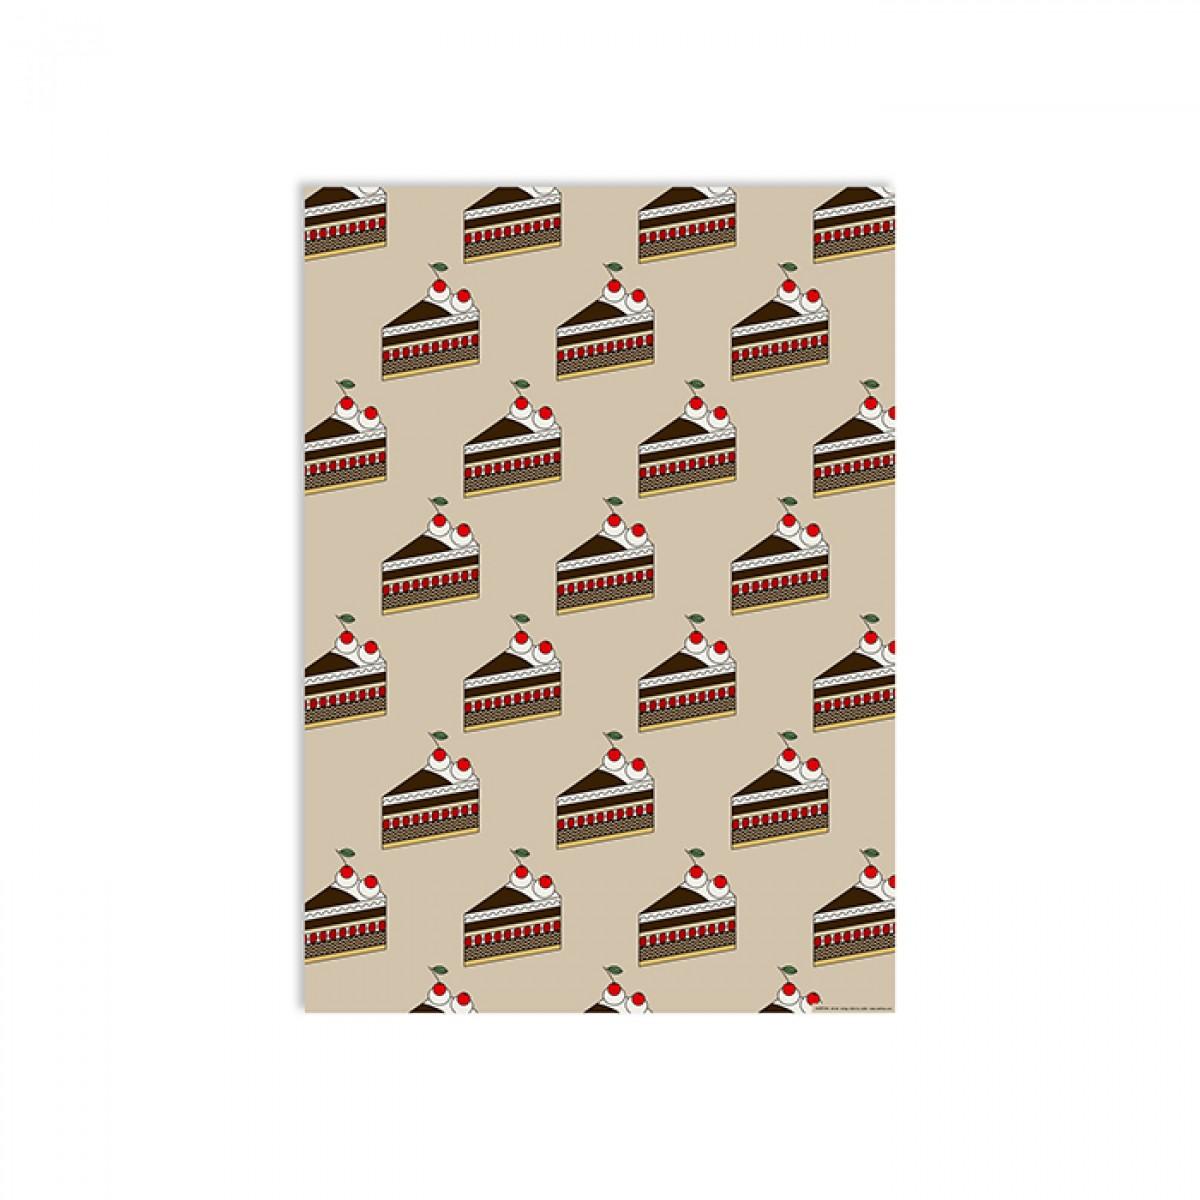 redfries wrap cherry cake – Geschenkpapier DIN B2, 3 Bögen